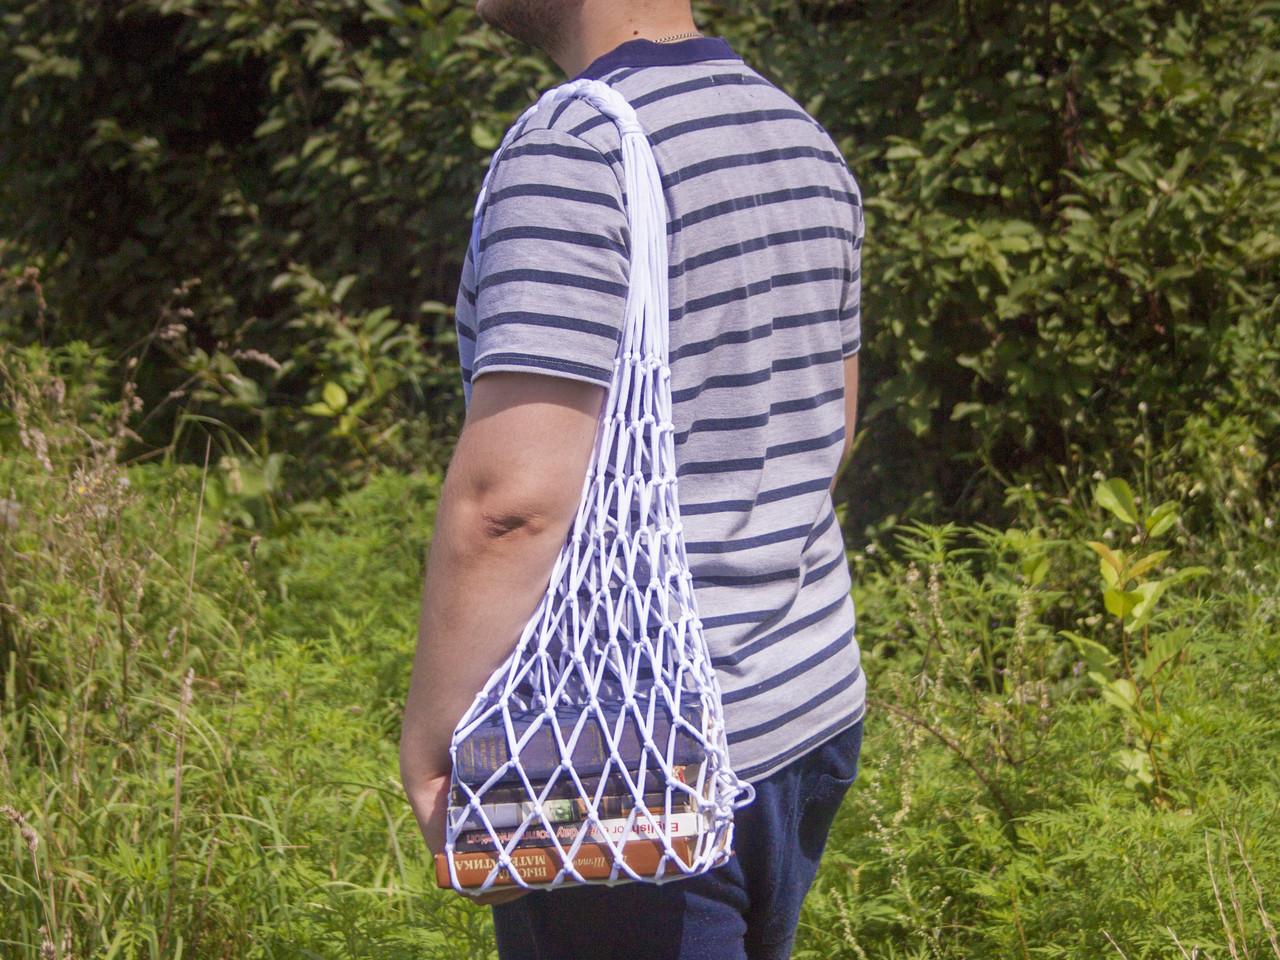 1490d43f5e5c Авоська - Сумка на плечо - Студенческая сумка - Пляжная сумка - Хлопковая  сумка